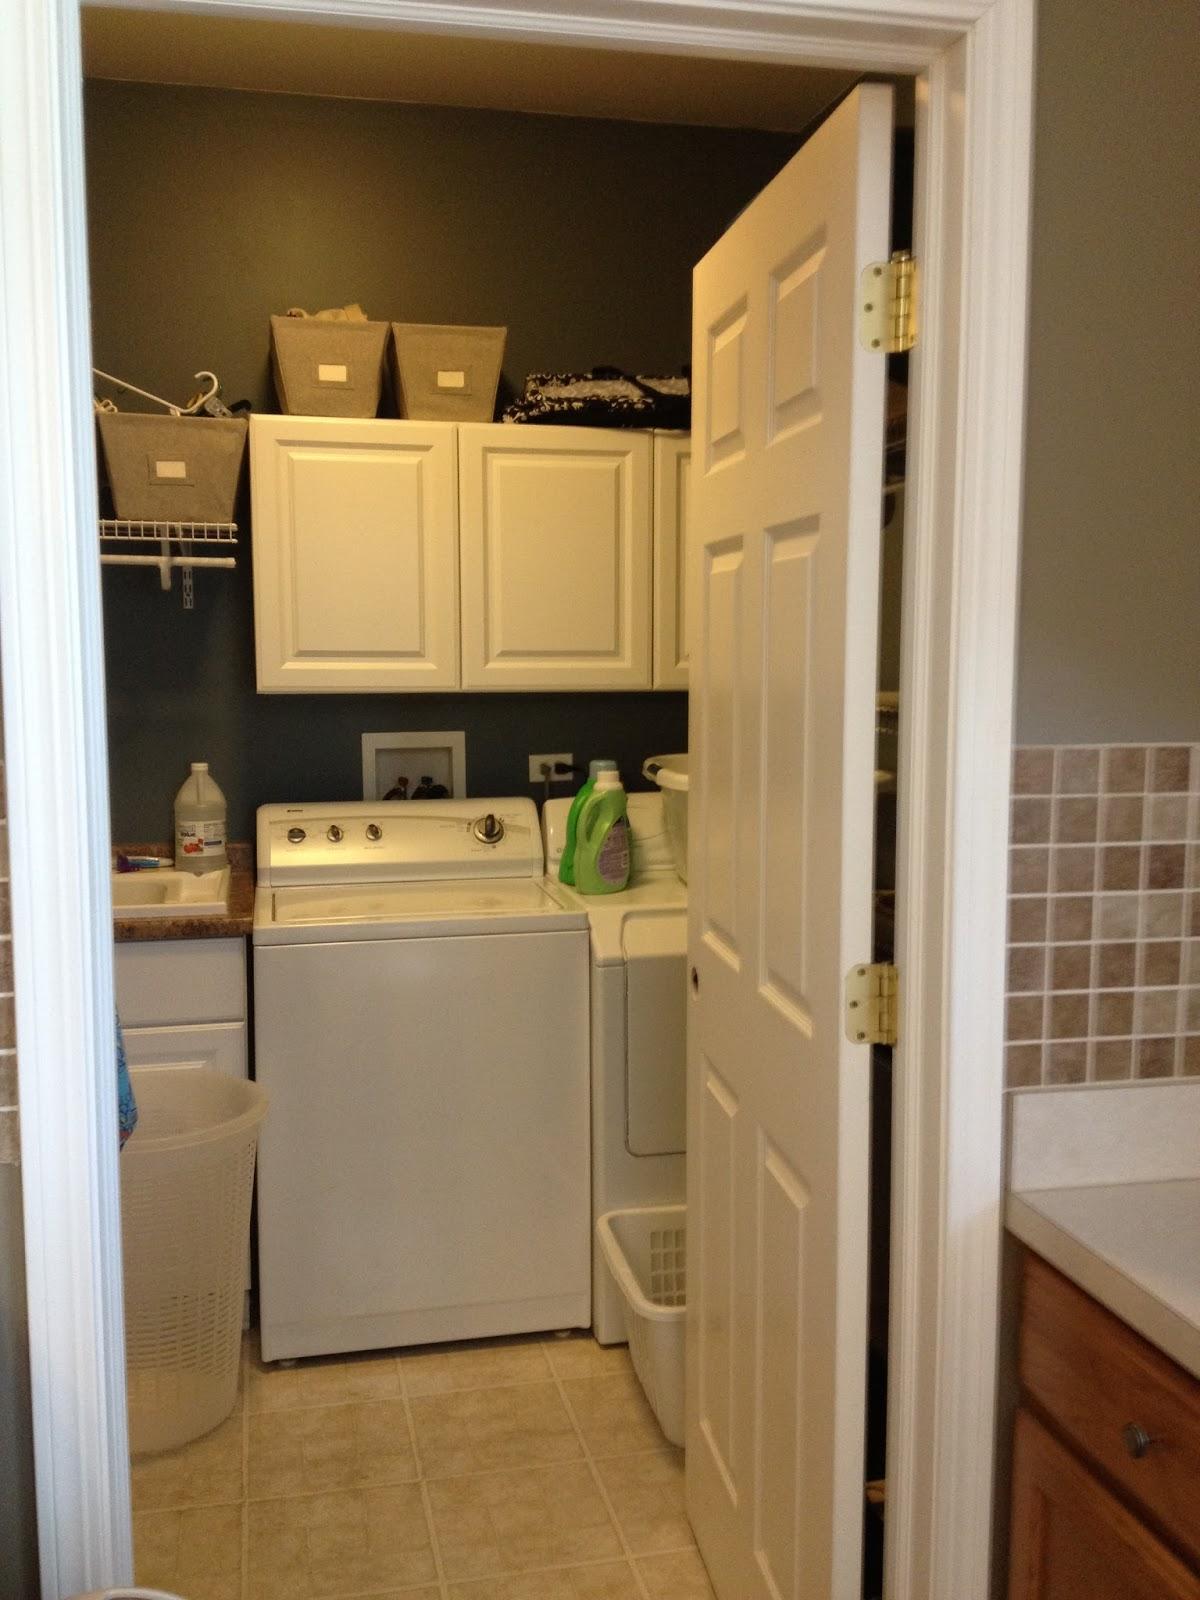 Everyday Larose Laundry Room Makeover Update Install